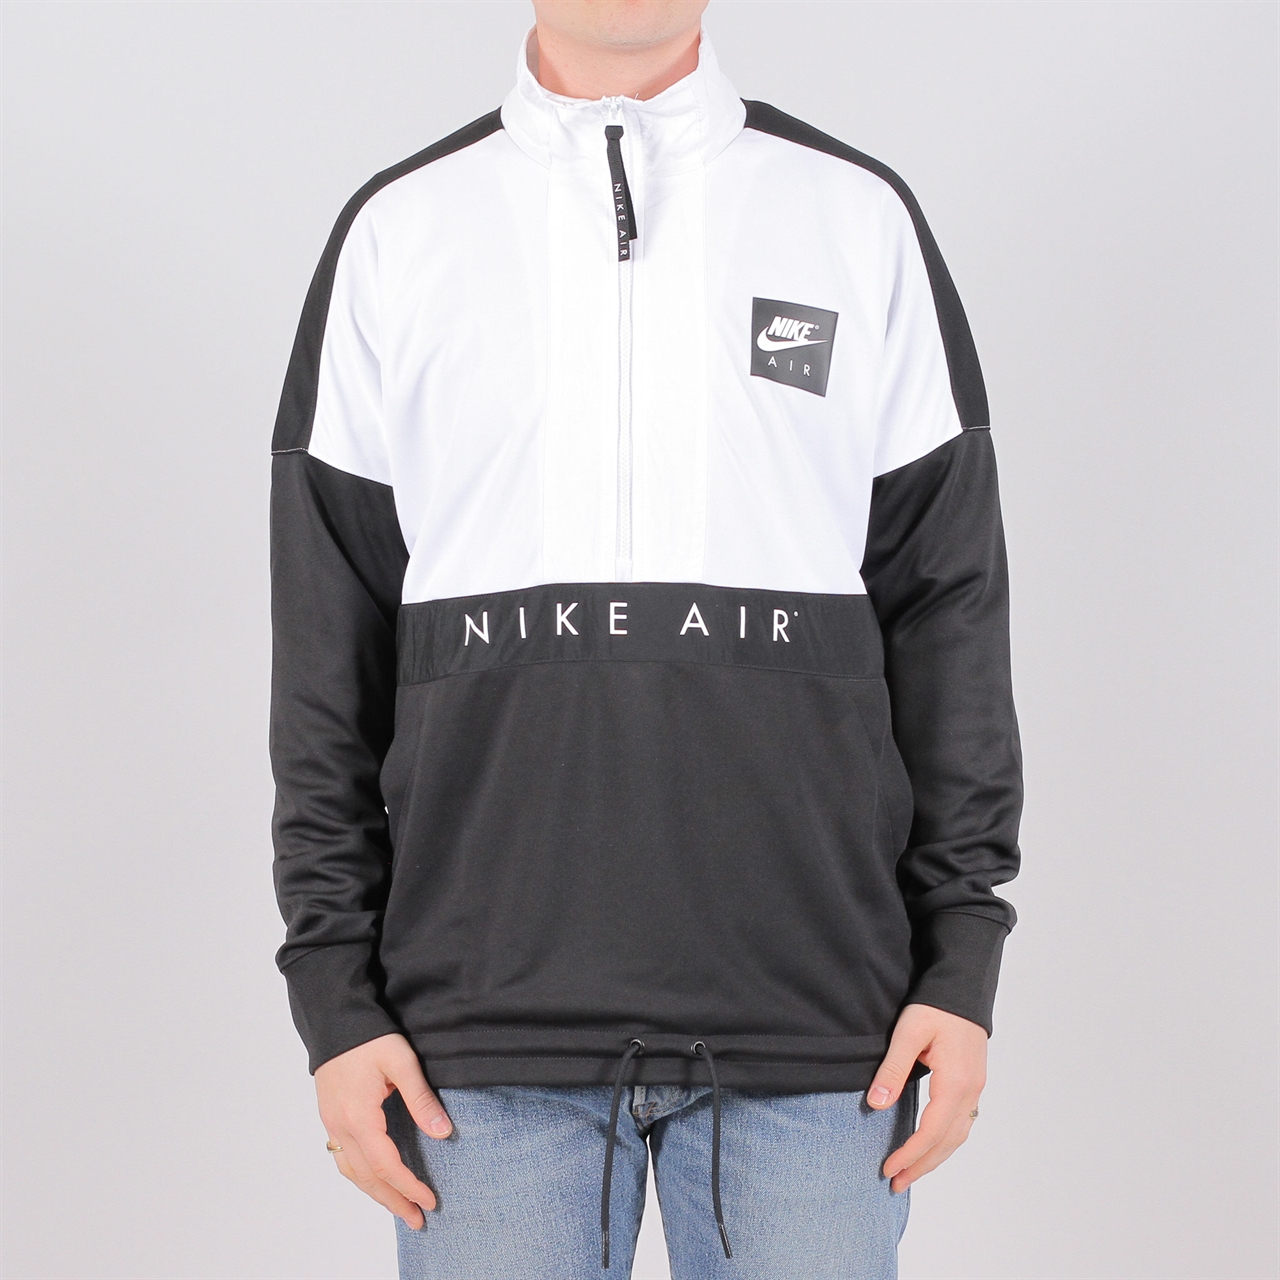 new concept c59ab 0448c nike sportswear air half zip 918324 100